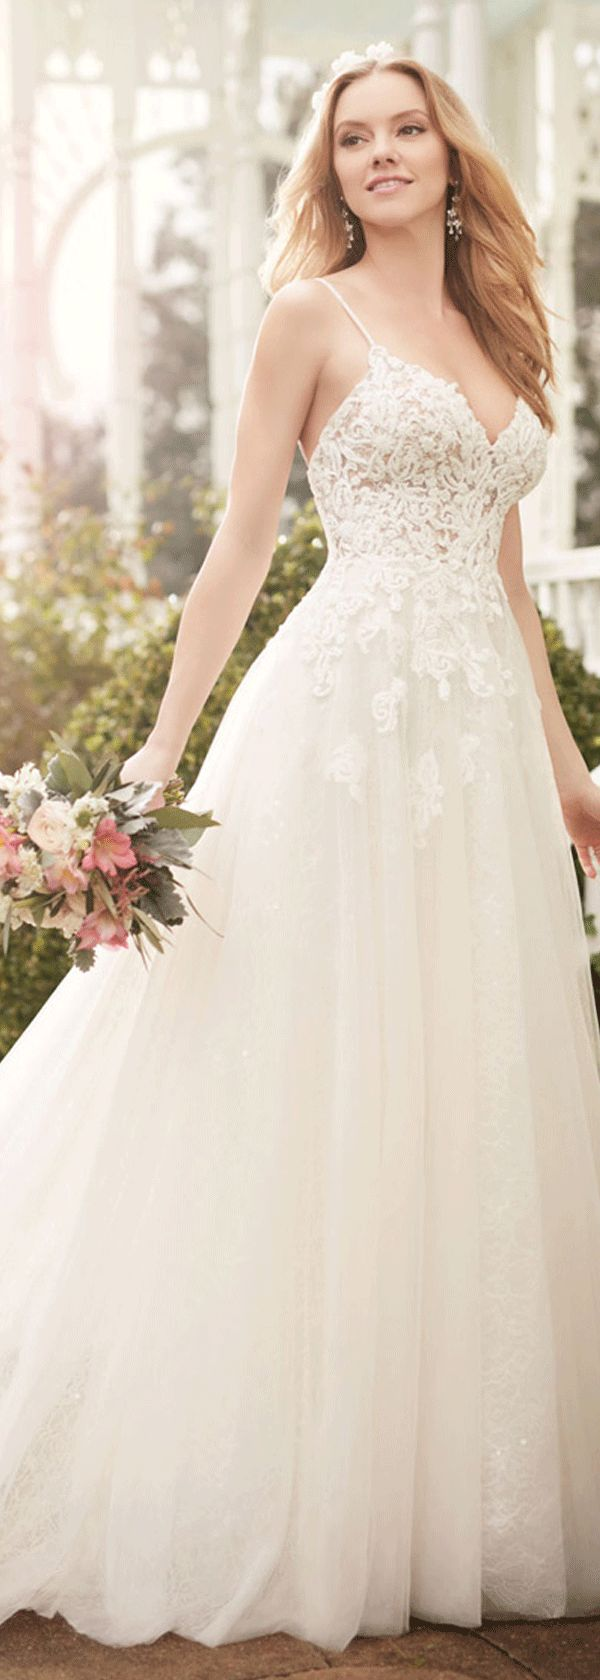 Best 25  Wedding Dress Straps ideas on Pinterest | Spaghetti strap ...